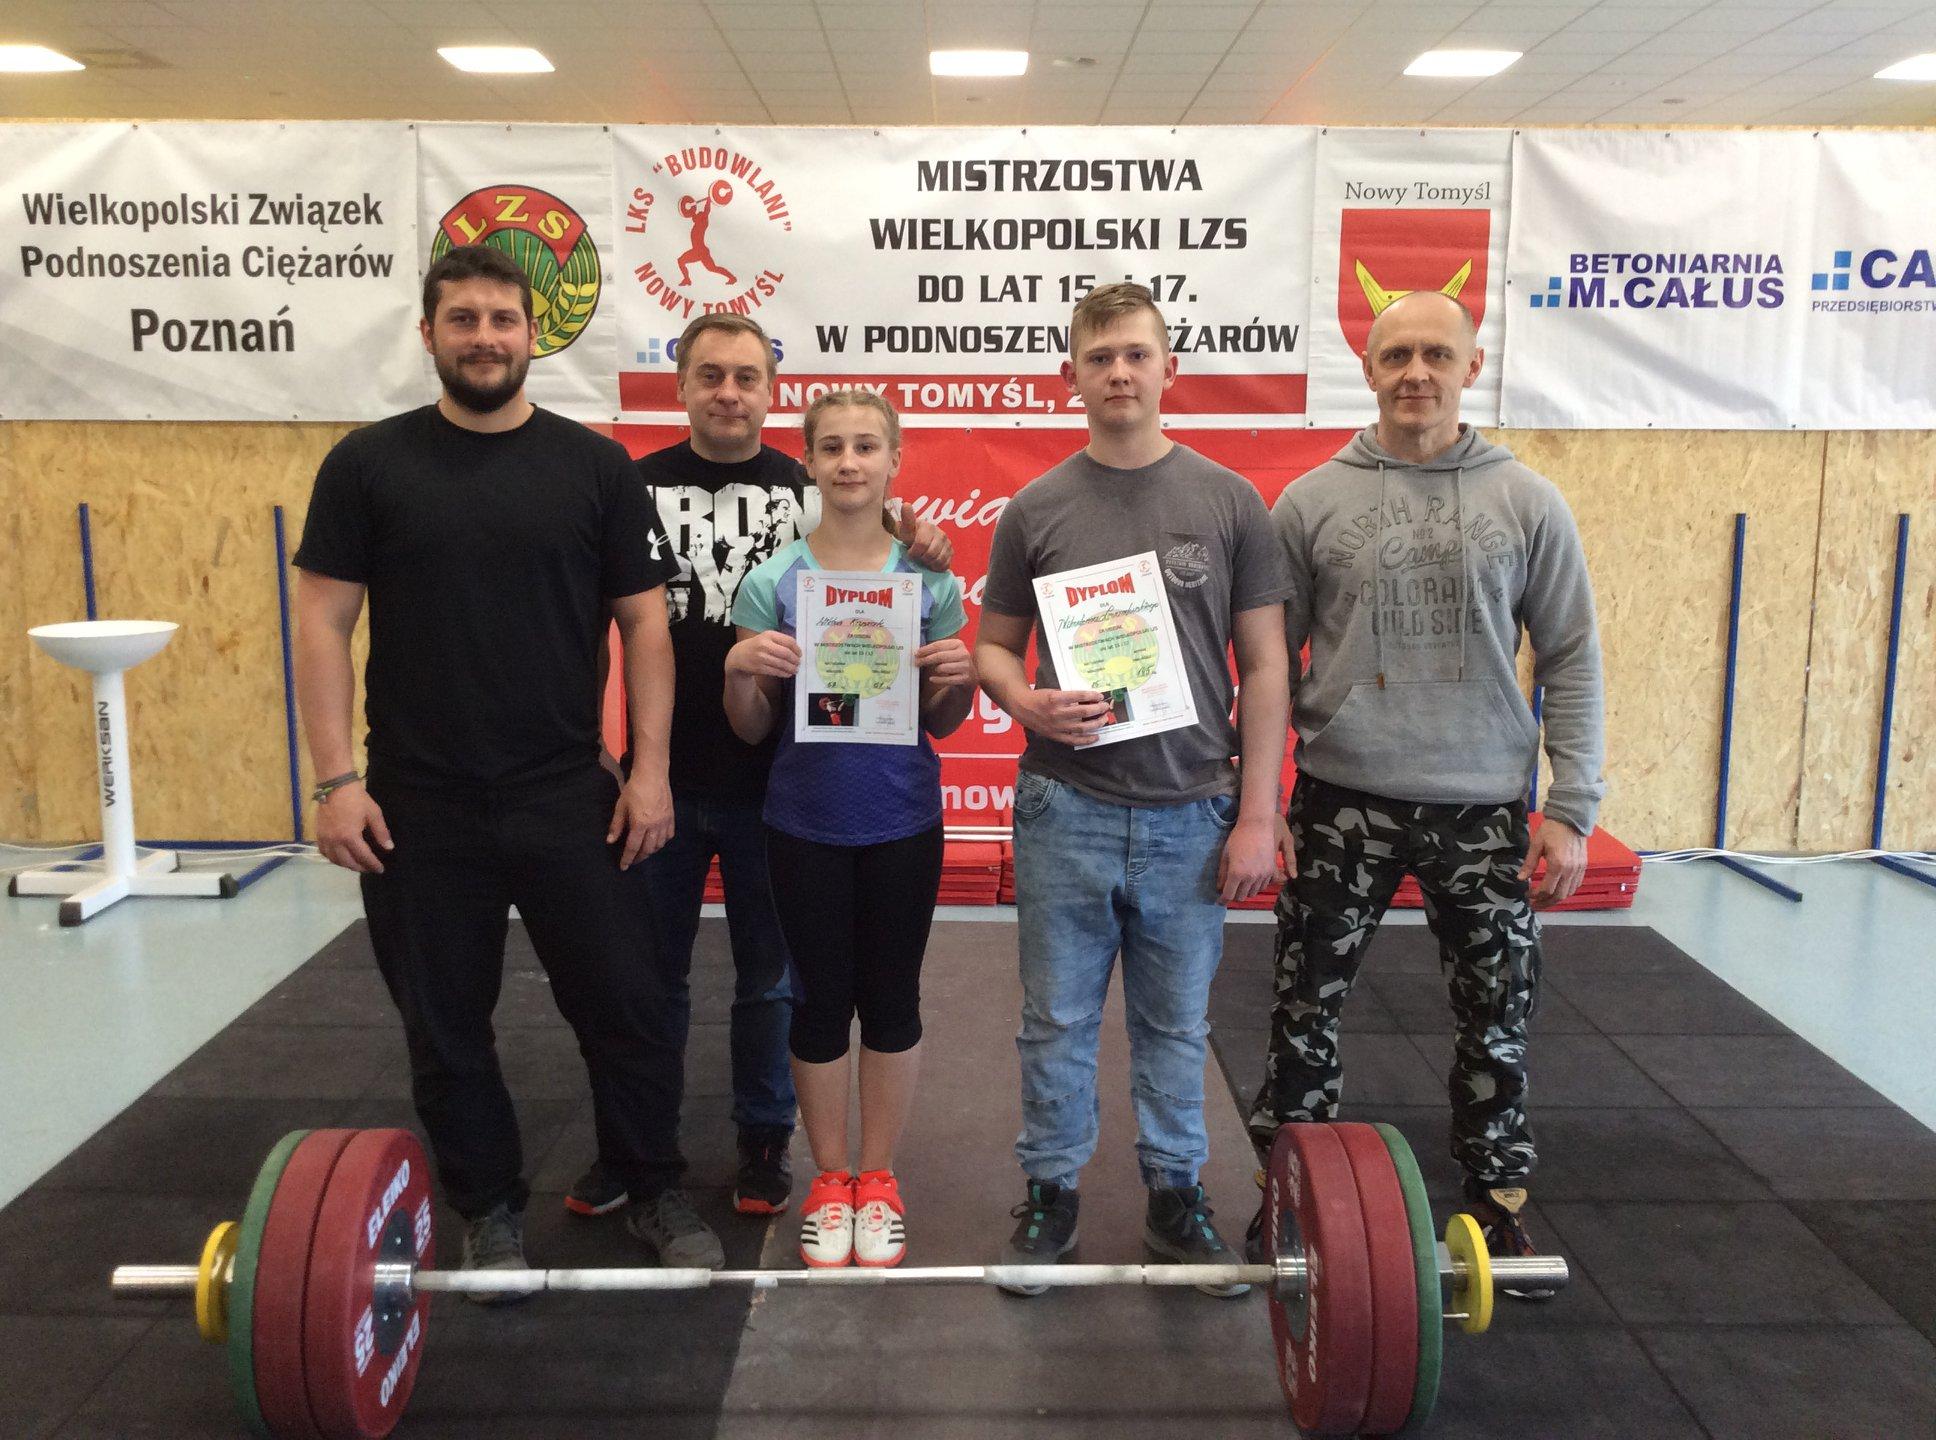 Bartosz Malak podnoszenie ciężarów, olimpijskie podnoszenie ciężarów